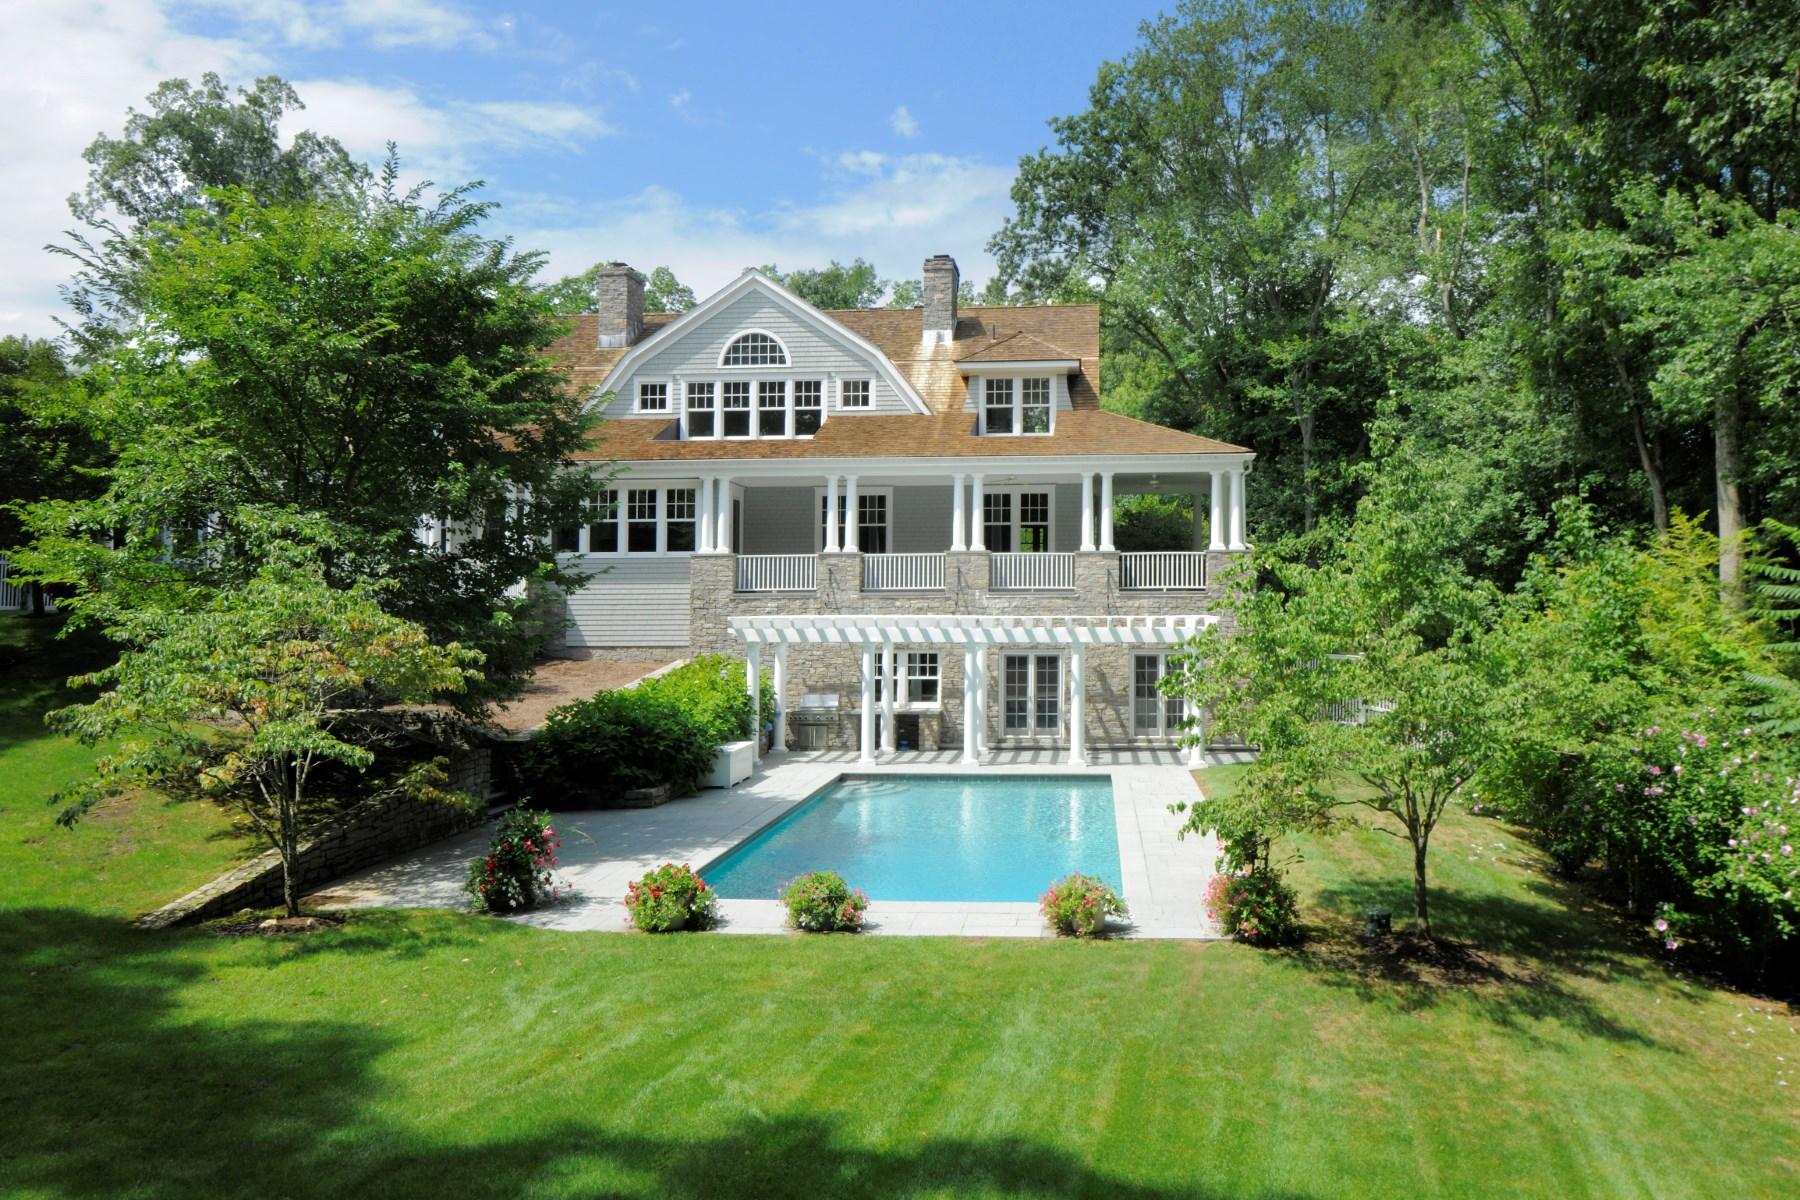 独户住宅 为 销售 在 Gracious Center Hall Colonial 17 Sherwood Farm Lane Greenwich, 康涅狄格州 06831 美国